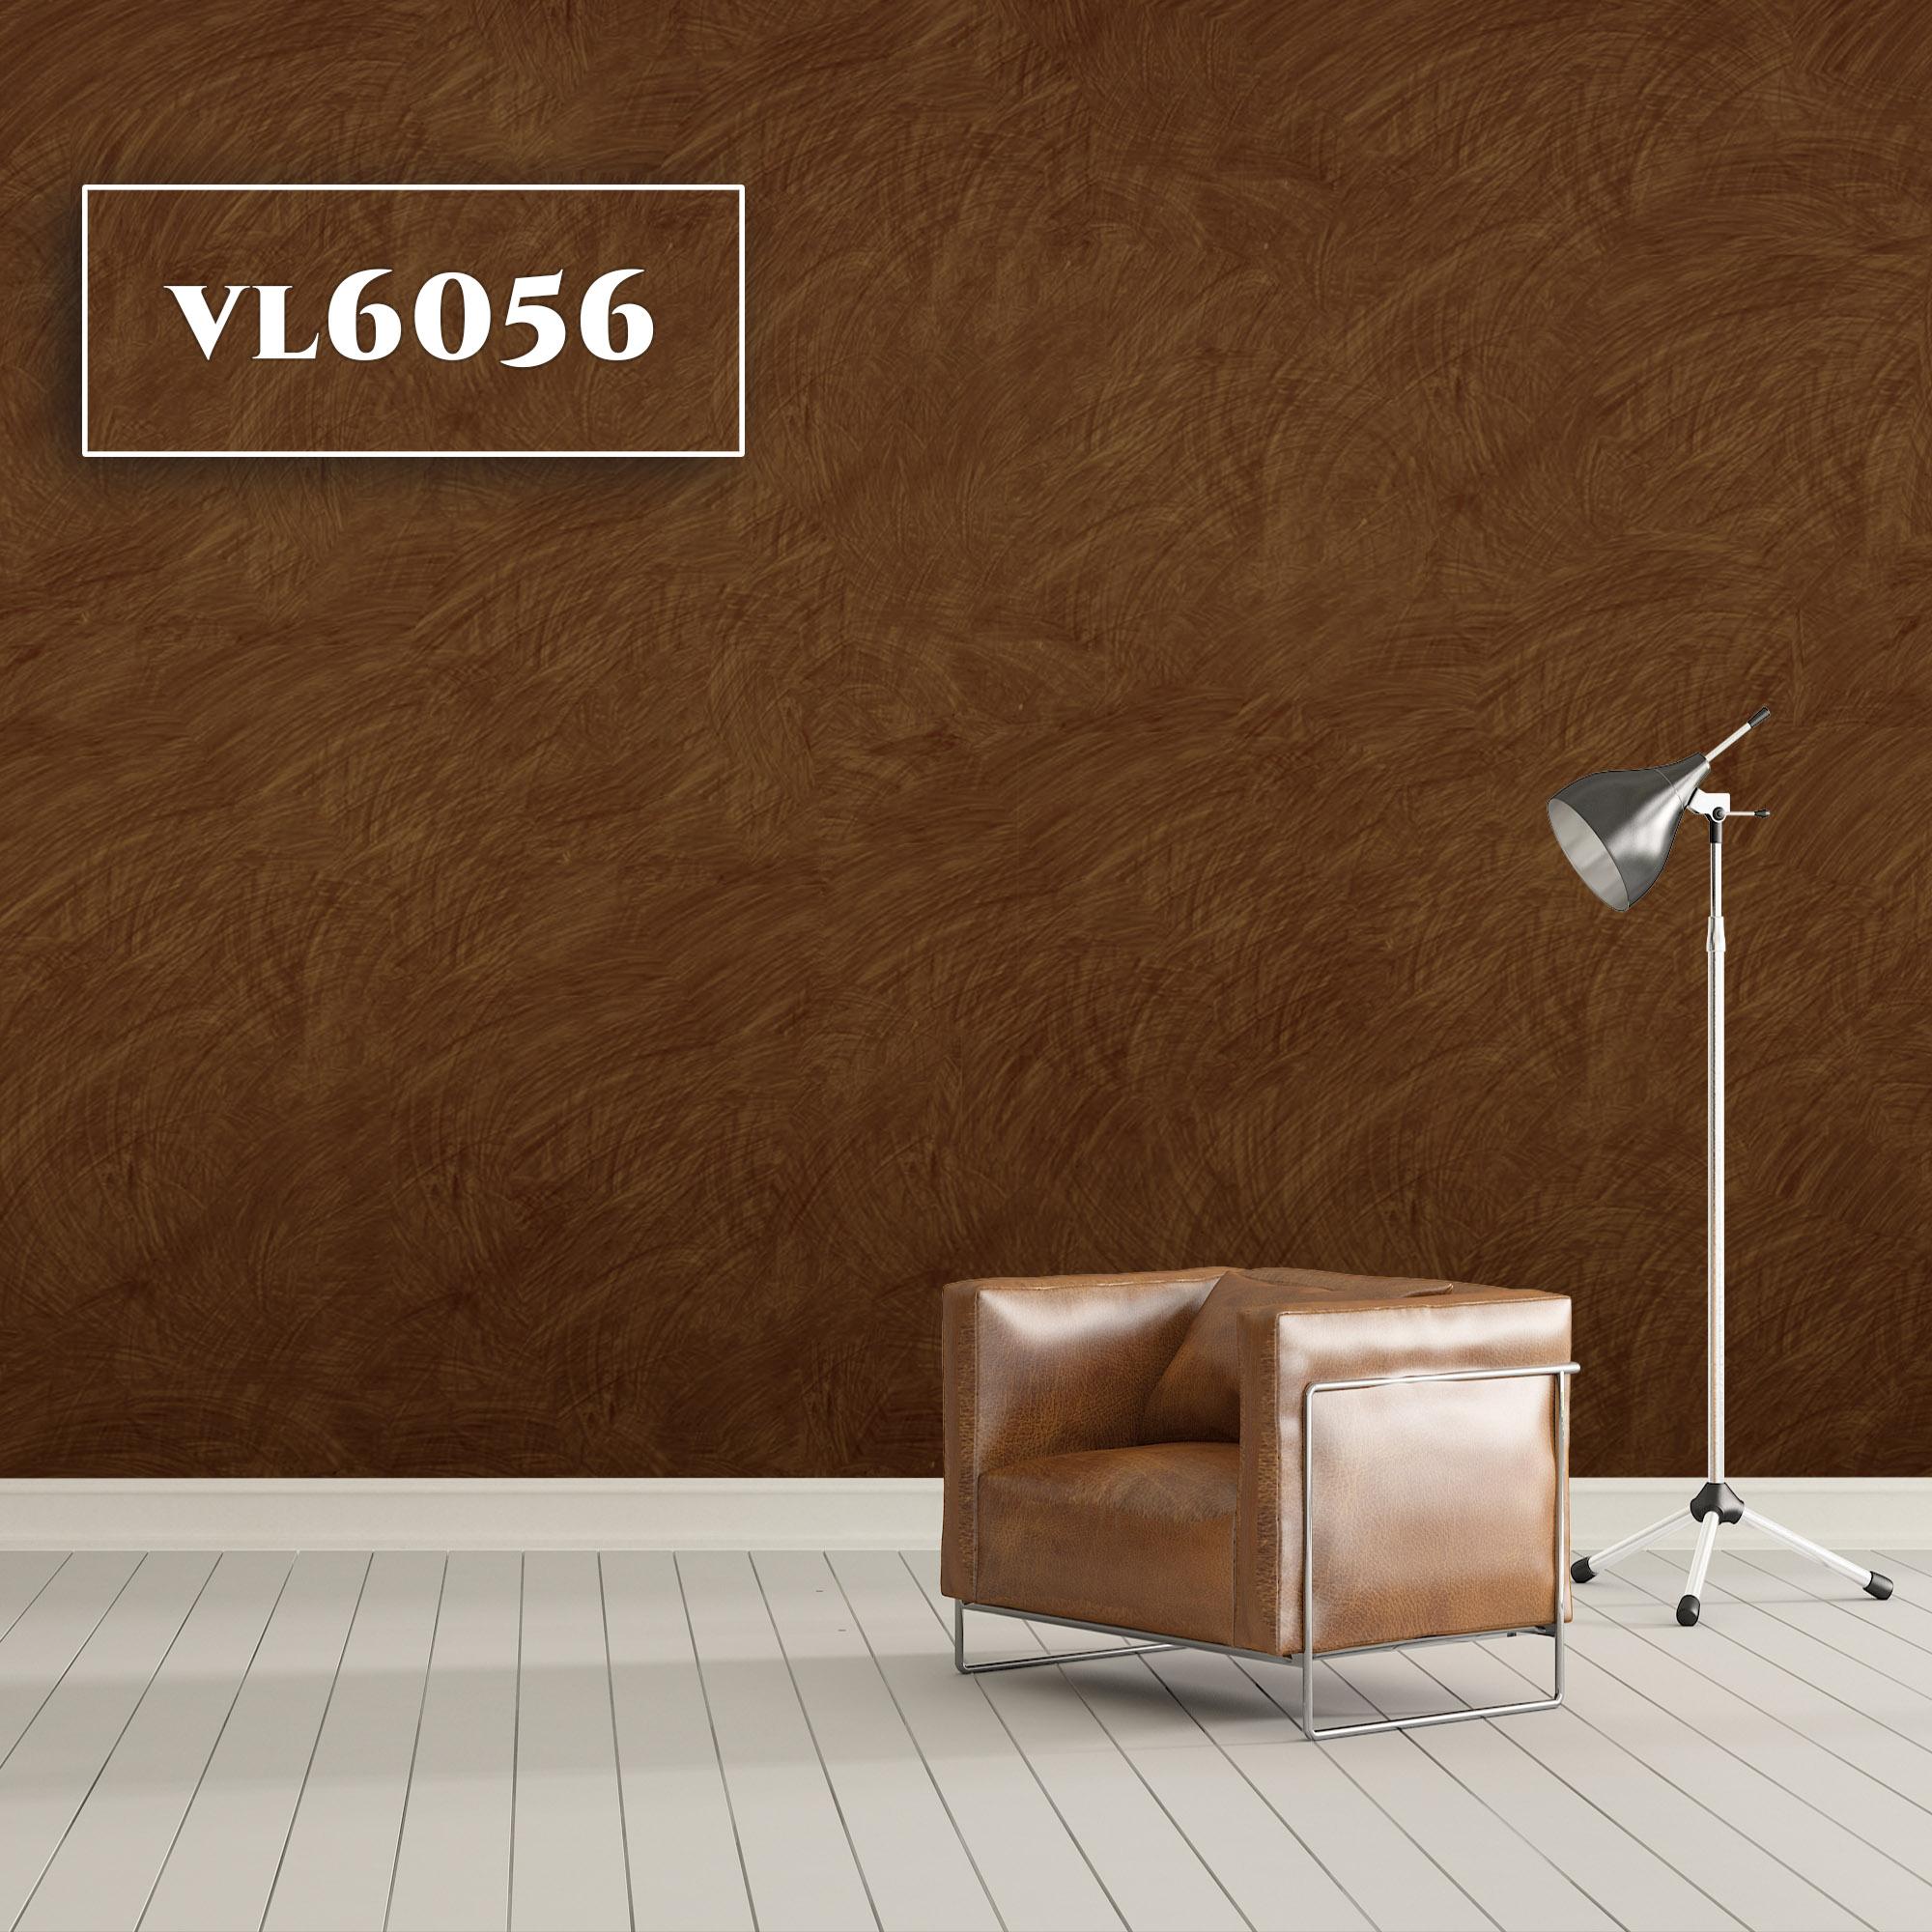 VL6056